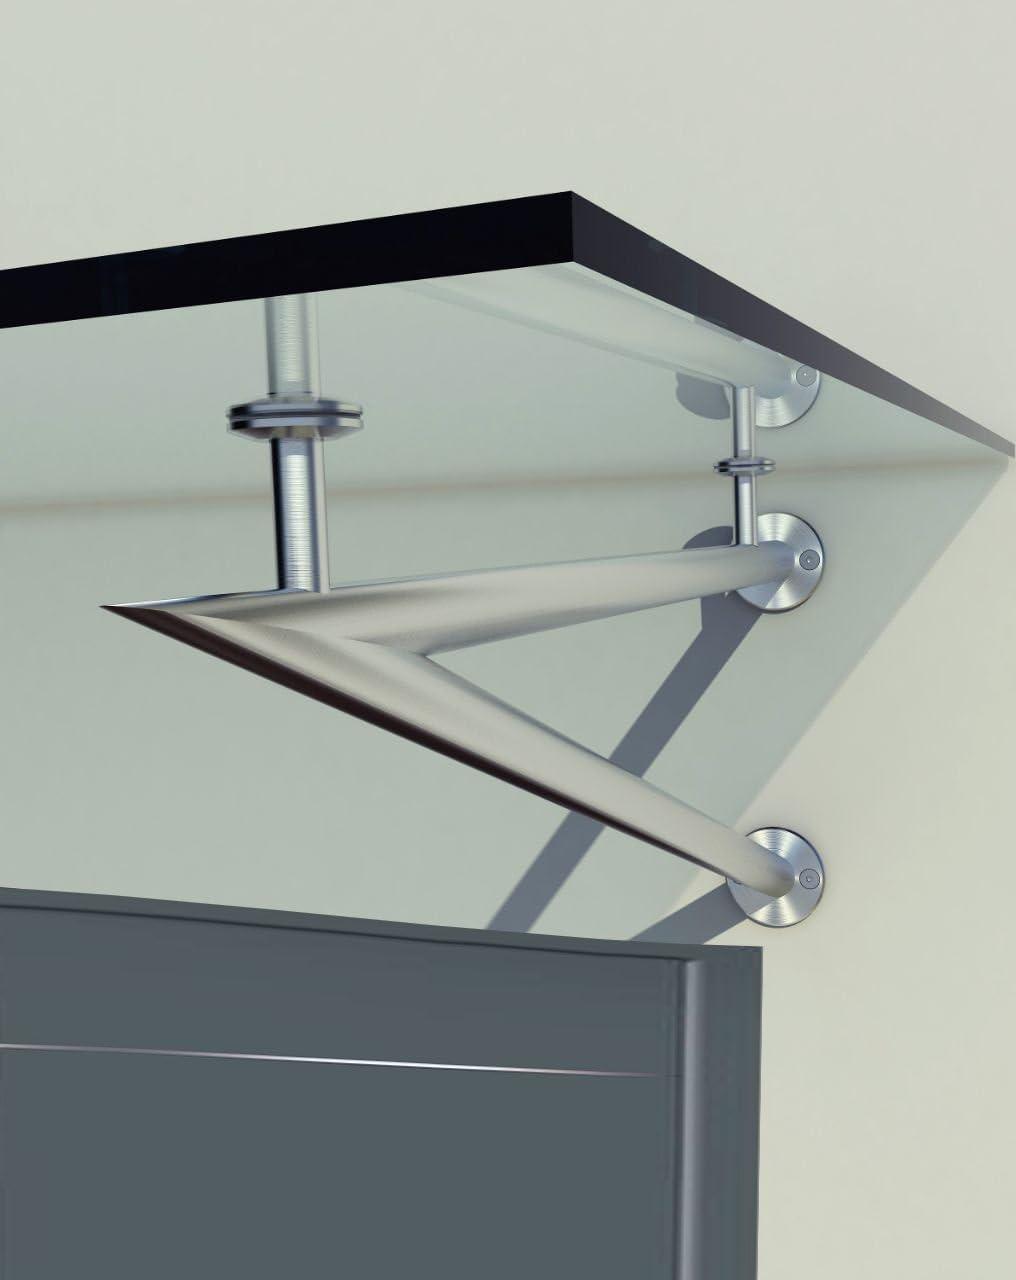 Edelstahlhalter Typ - V, 170x90cm Glasvordach Vordach Pavillion T/ürvordach Haust/ürvordach VSG-Glas inkl Glaszentrum Hagen